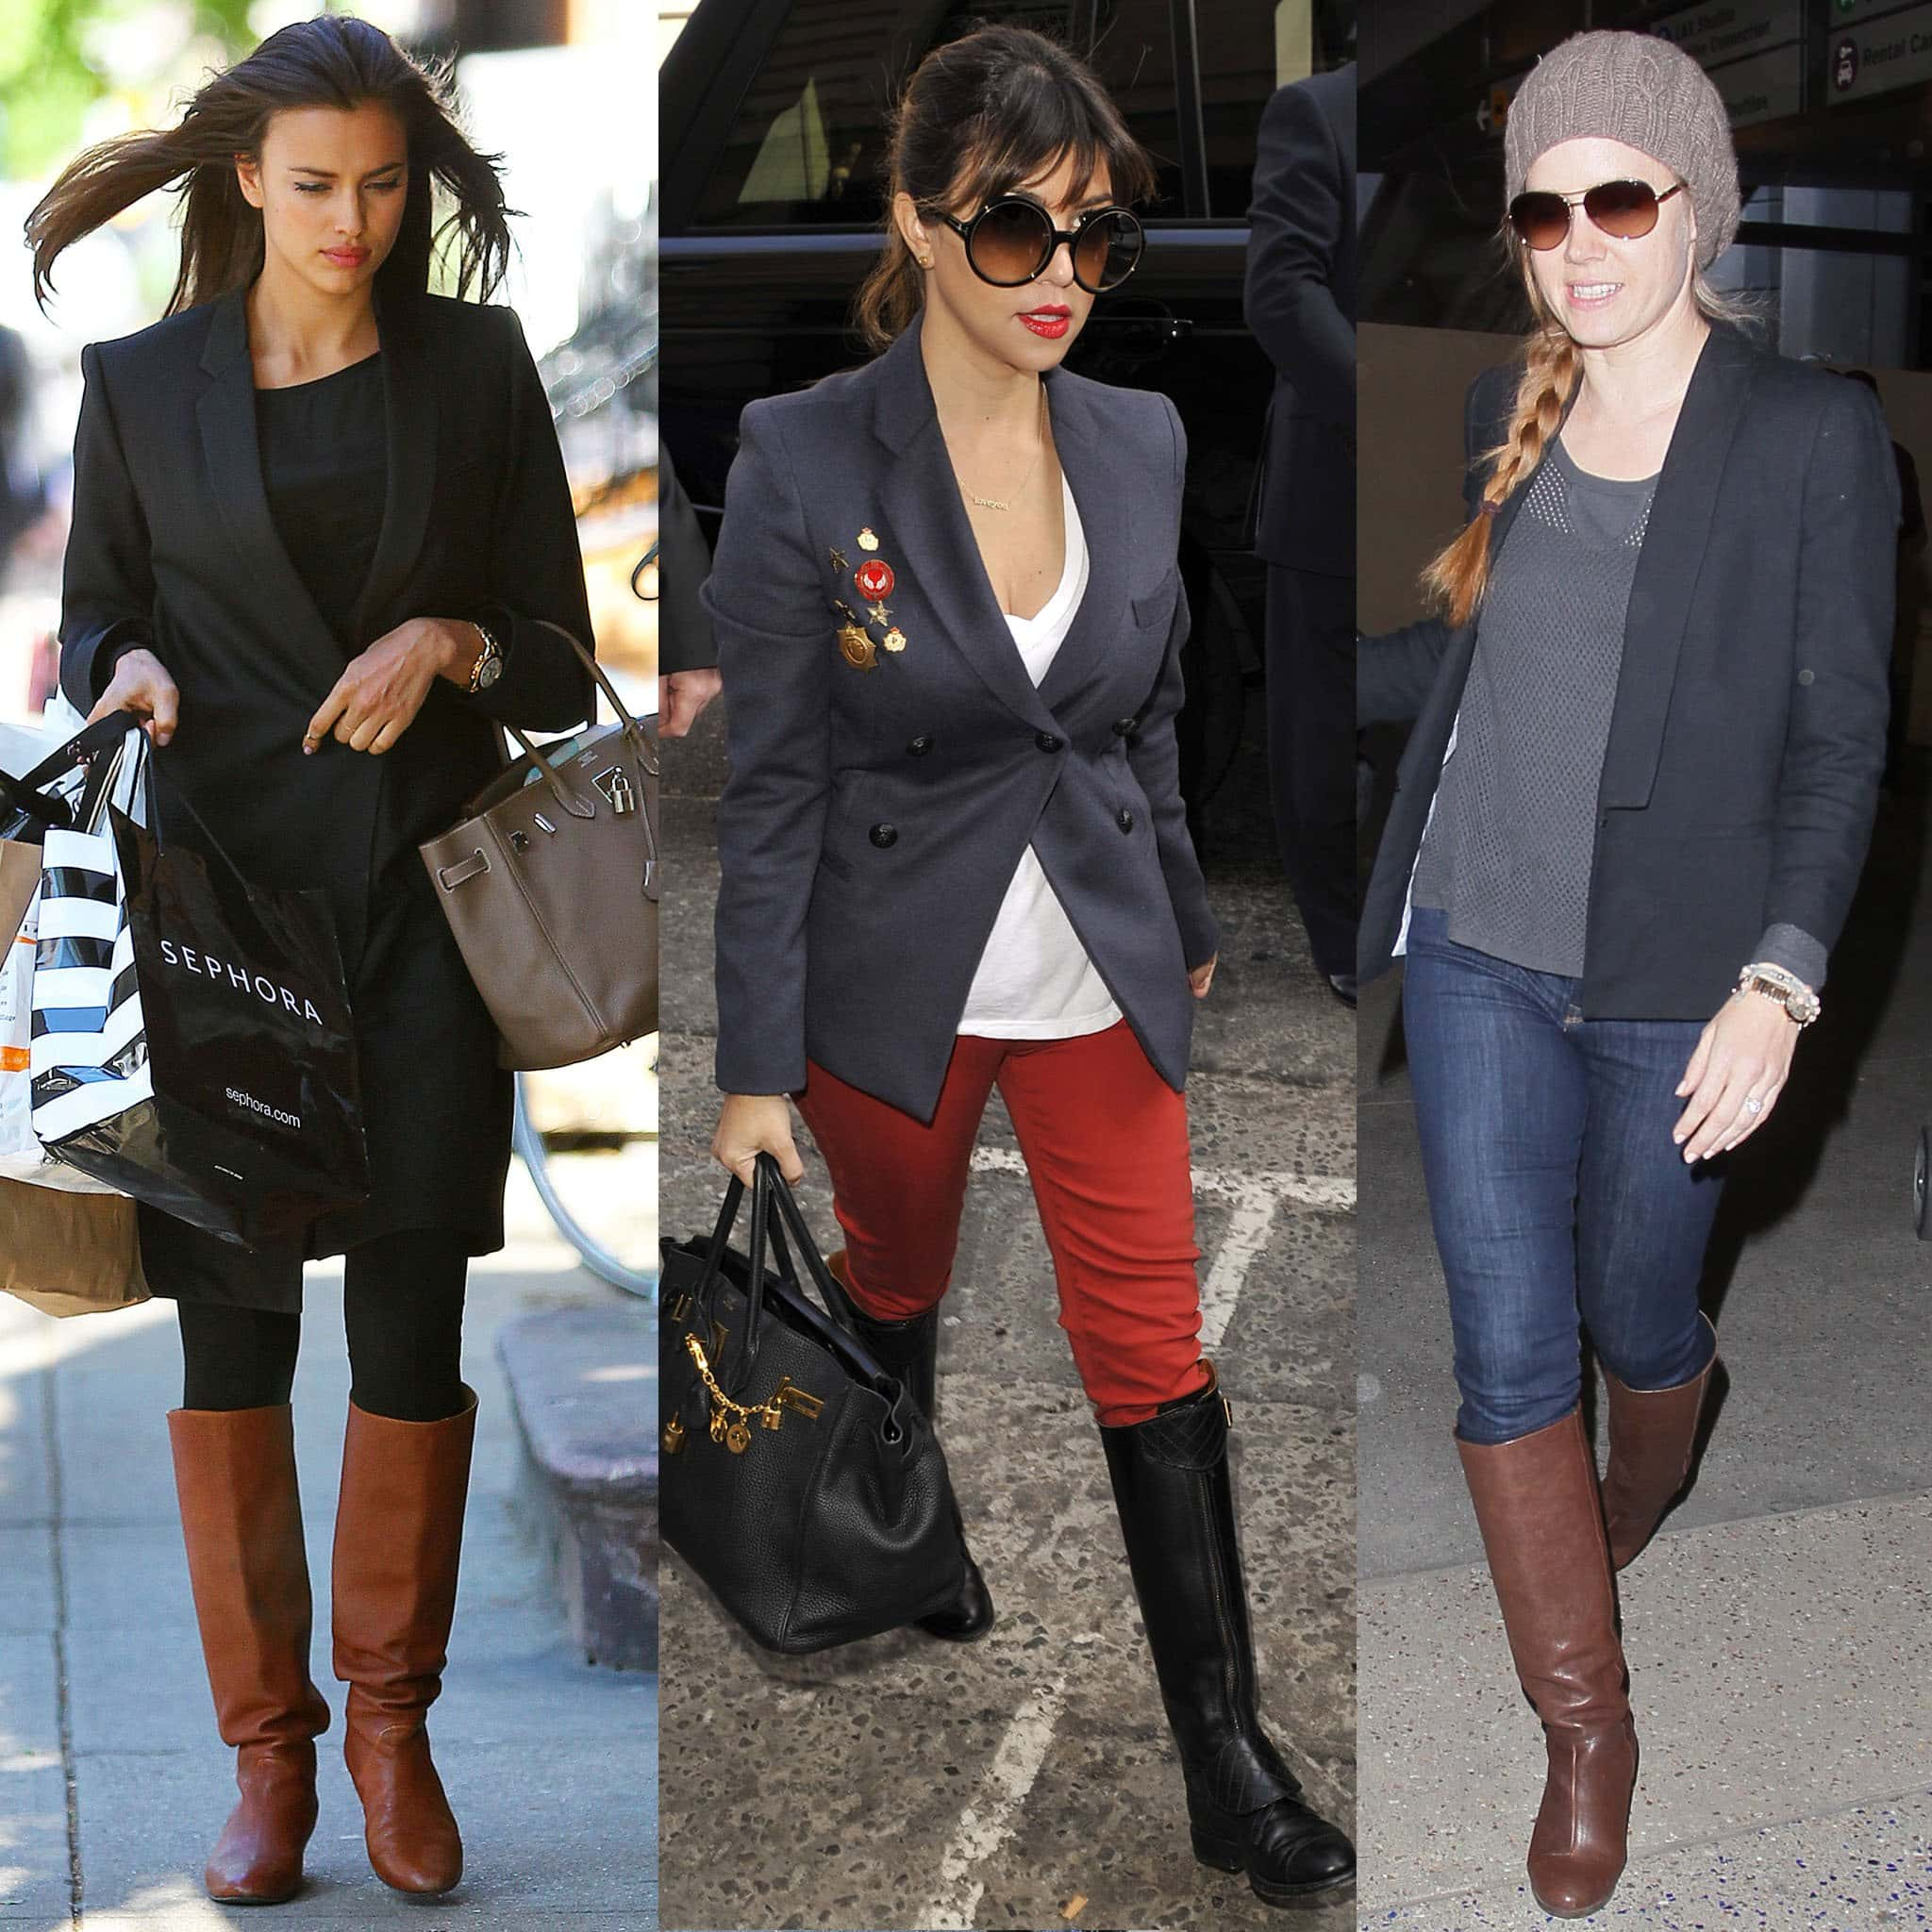 Irina Shayk, Kourtney Kardashian, and Amy Adams show how to wear riding boots with blazers for a chic office look